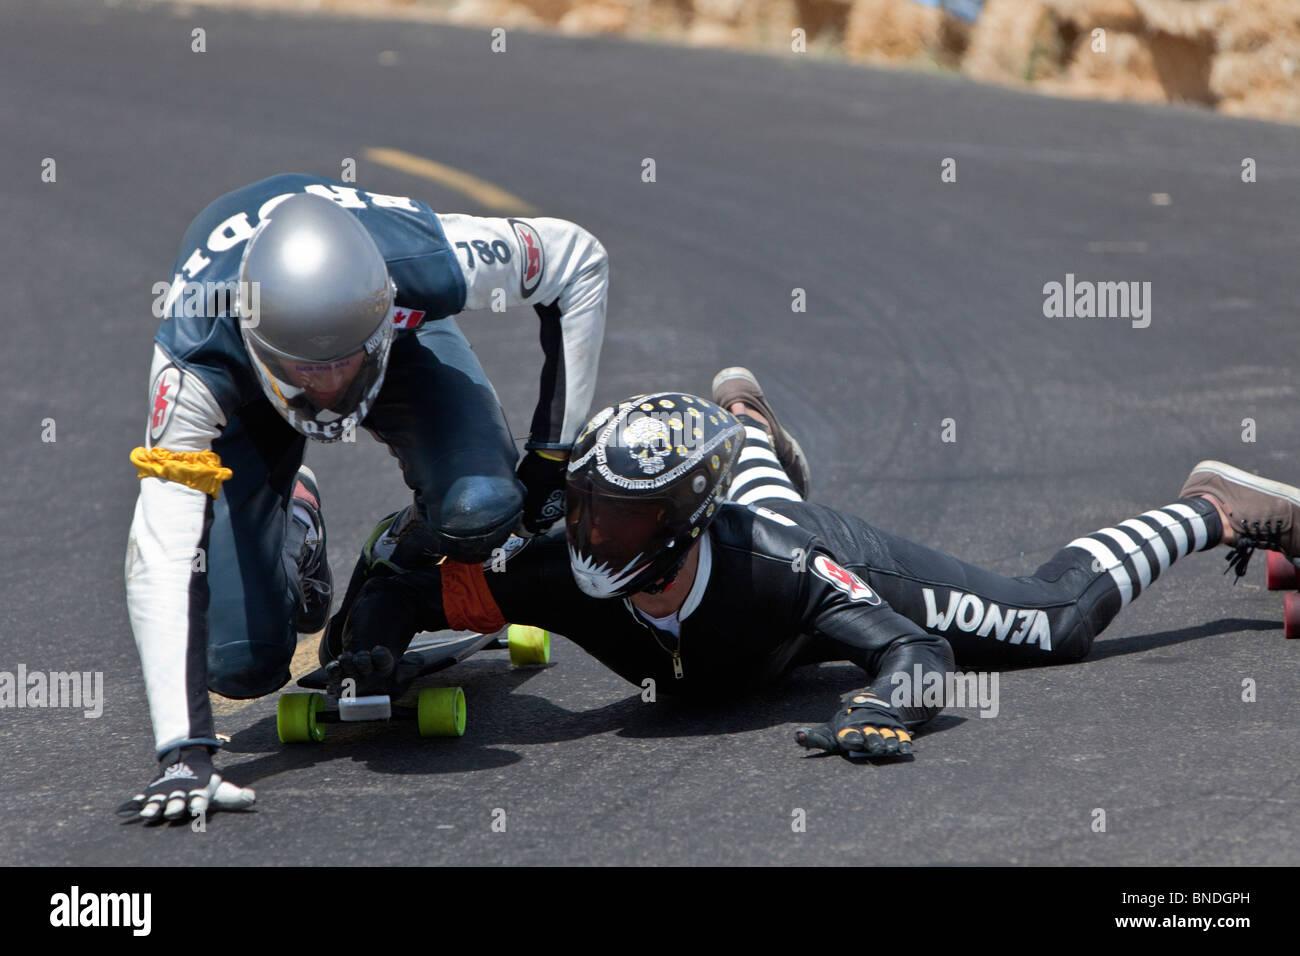 Skateboarders schiantarsi, IGSA World Cup Series. Immagini Stock